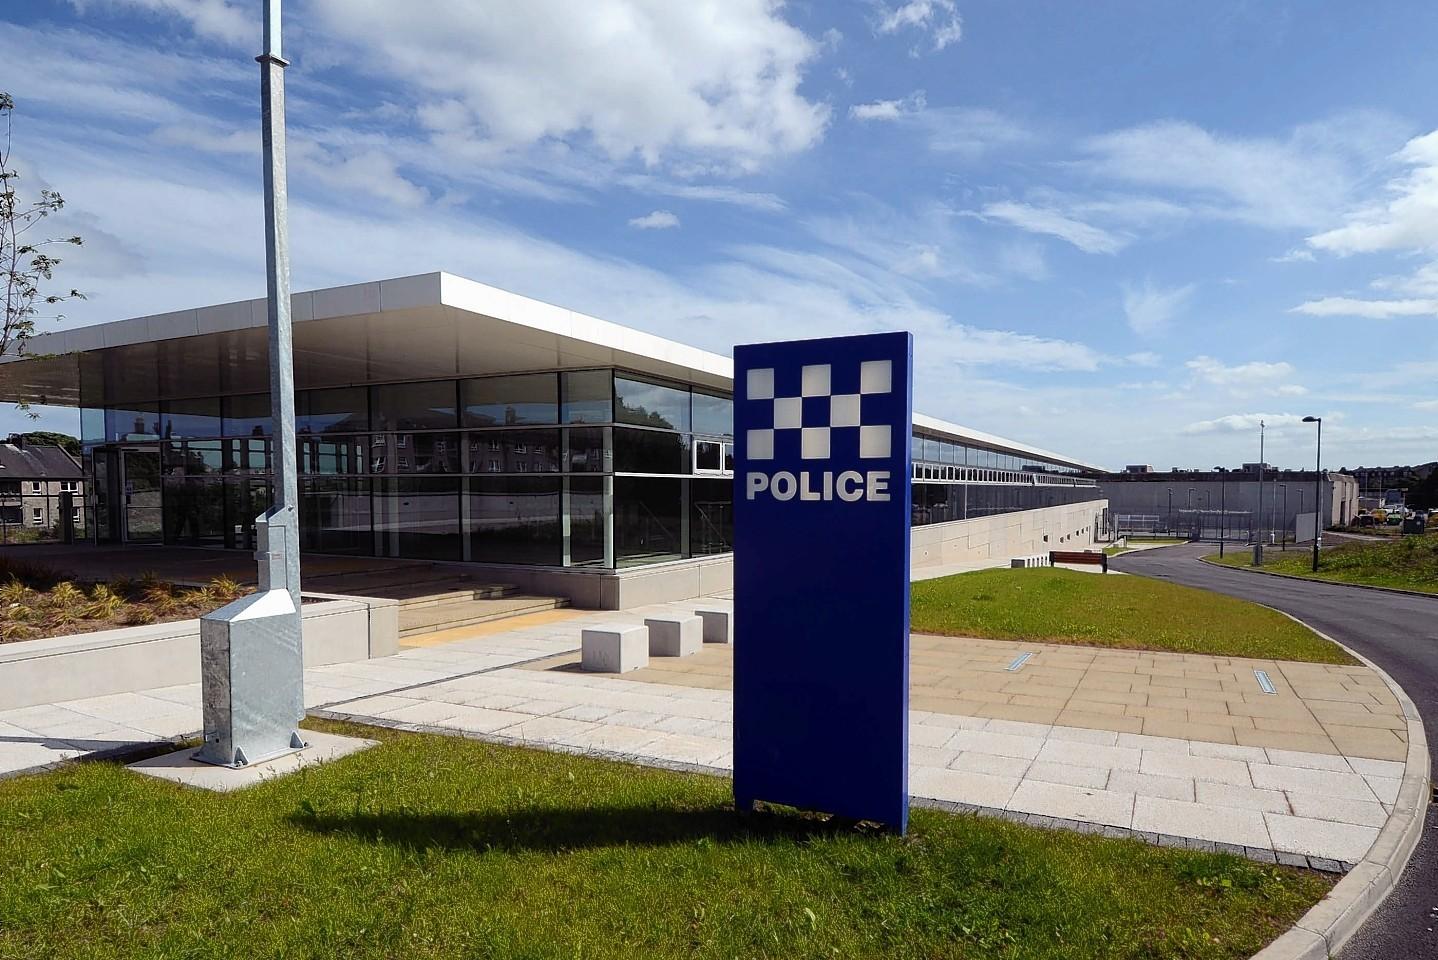 Police Scotland Custody Centre at Kittybrewster, Aberdeen